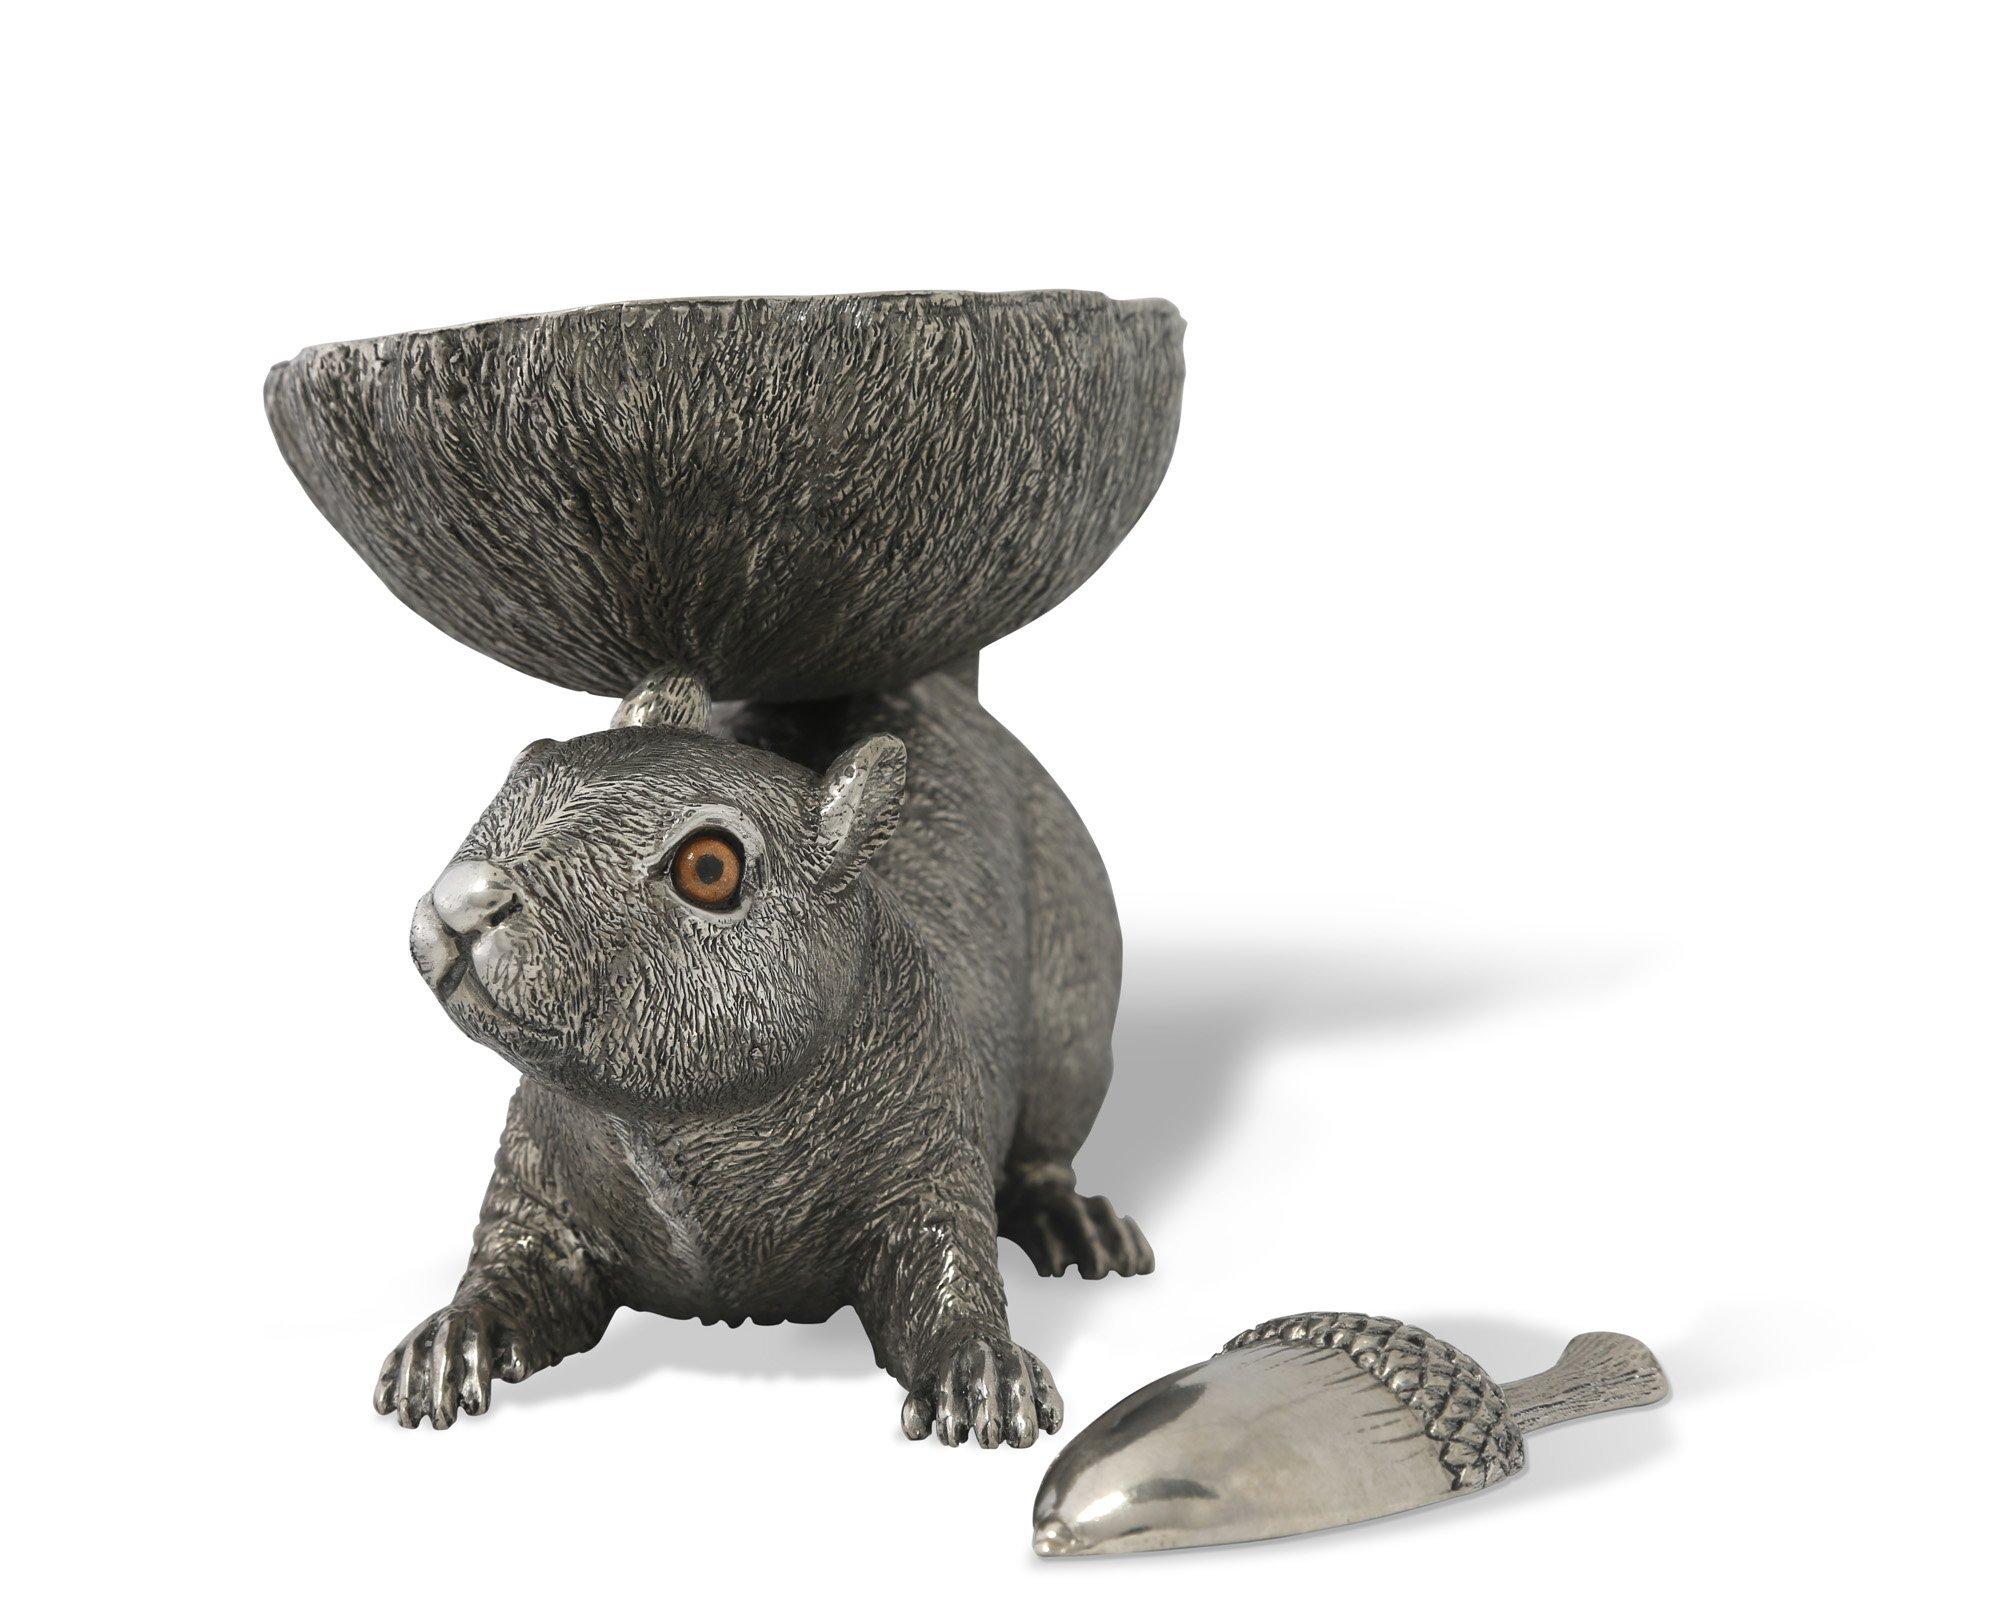 Vagabond House Pewter Life Size Squirrel Nut Bowl